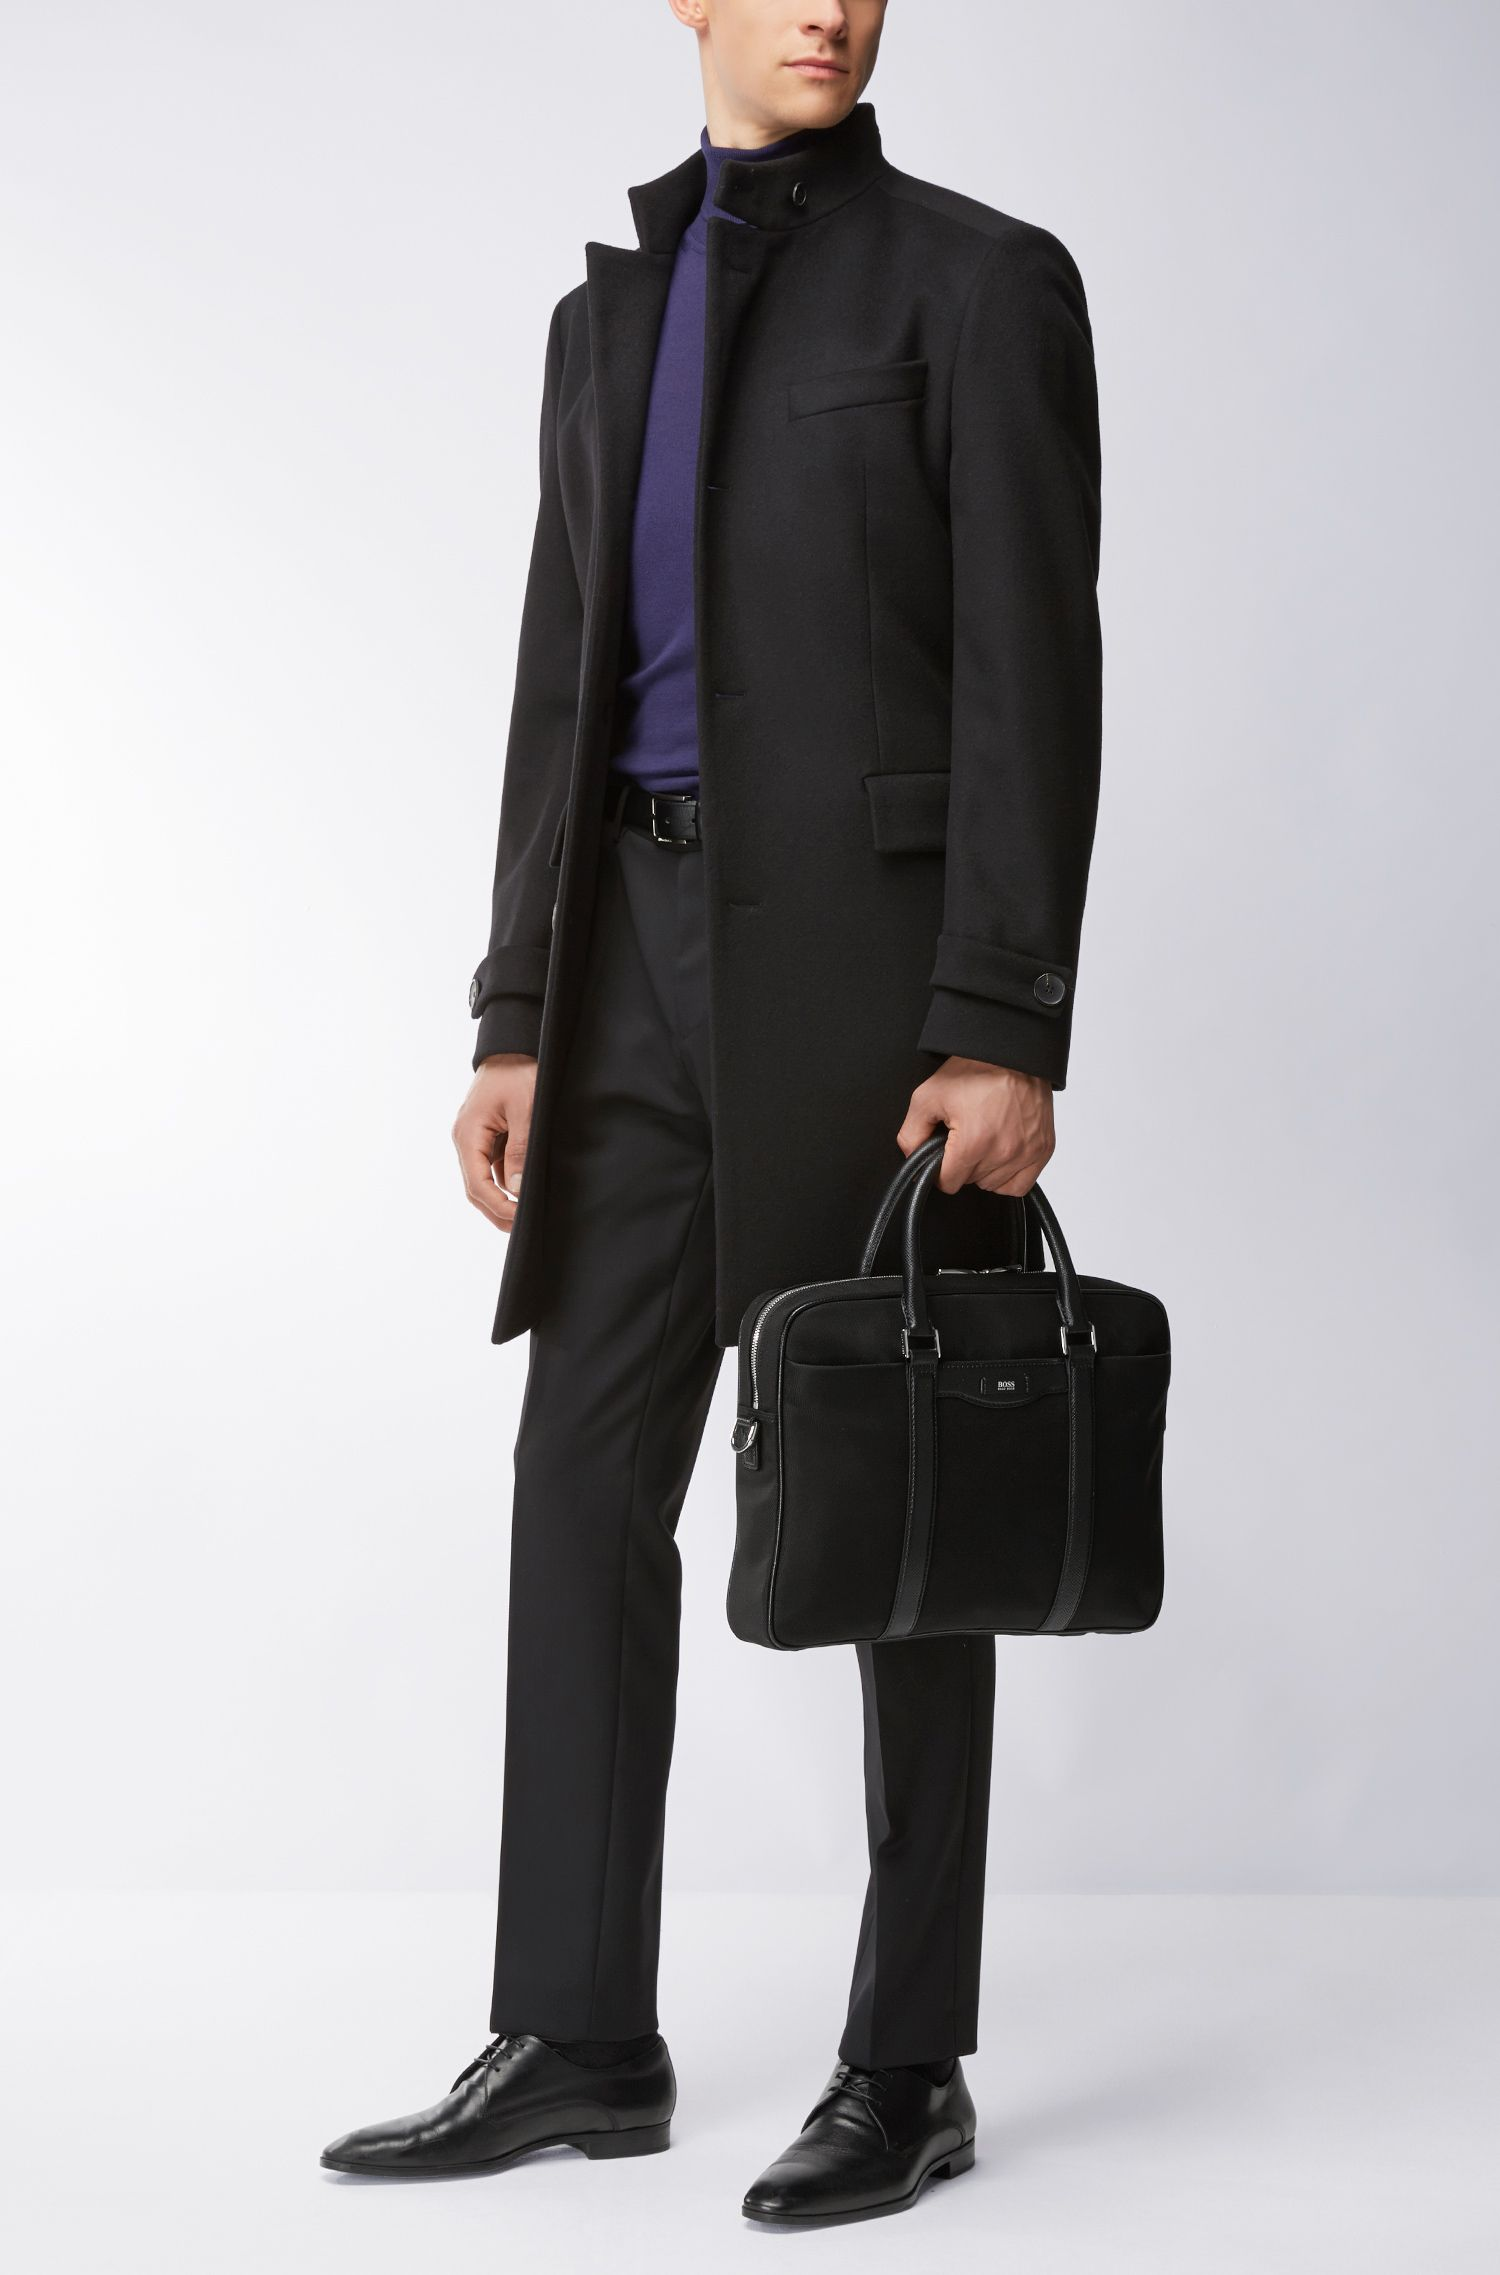 Nylon Blend Workbag | Signature L S Doc